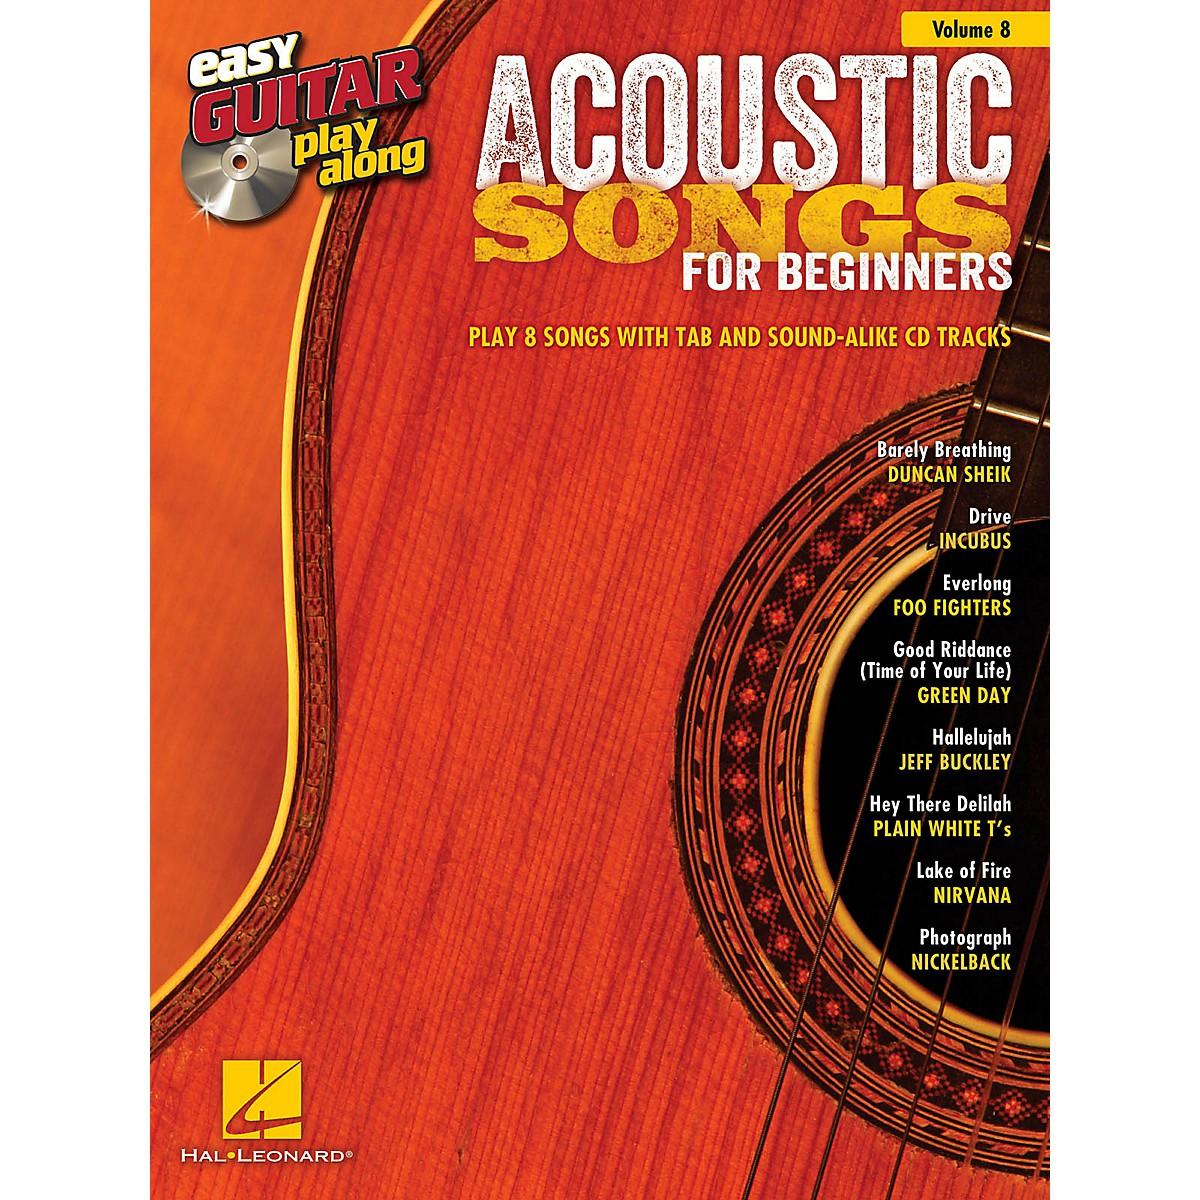 Hal Leonard Acoustic Songs For Beginners Easy Guitar Play-Along Volume 8 (Book/CD)